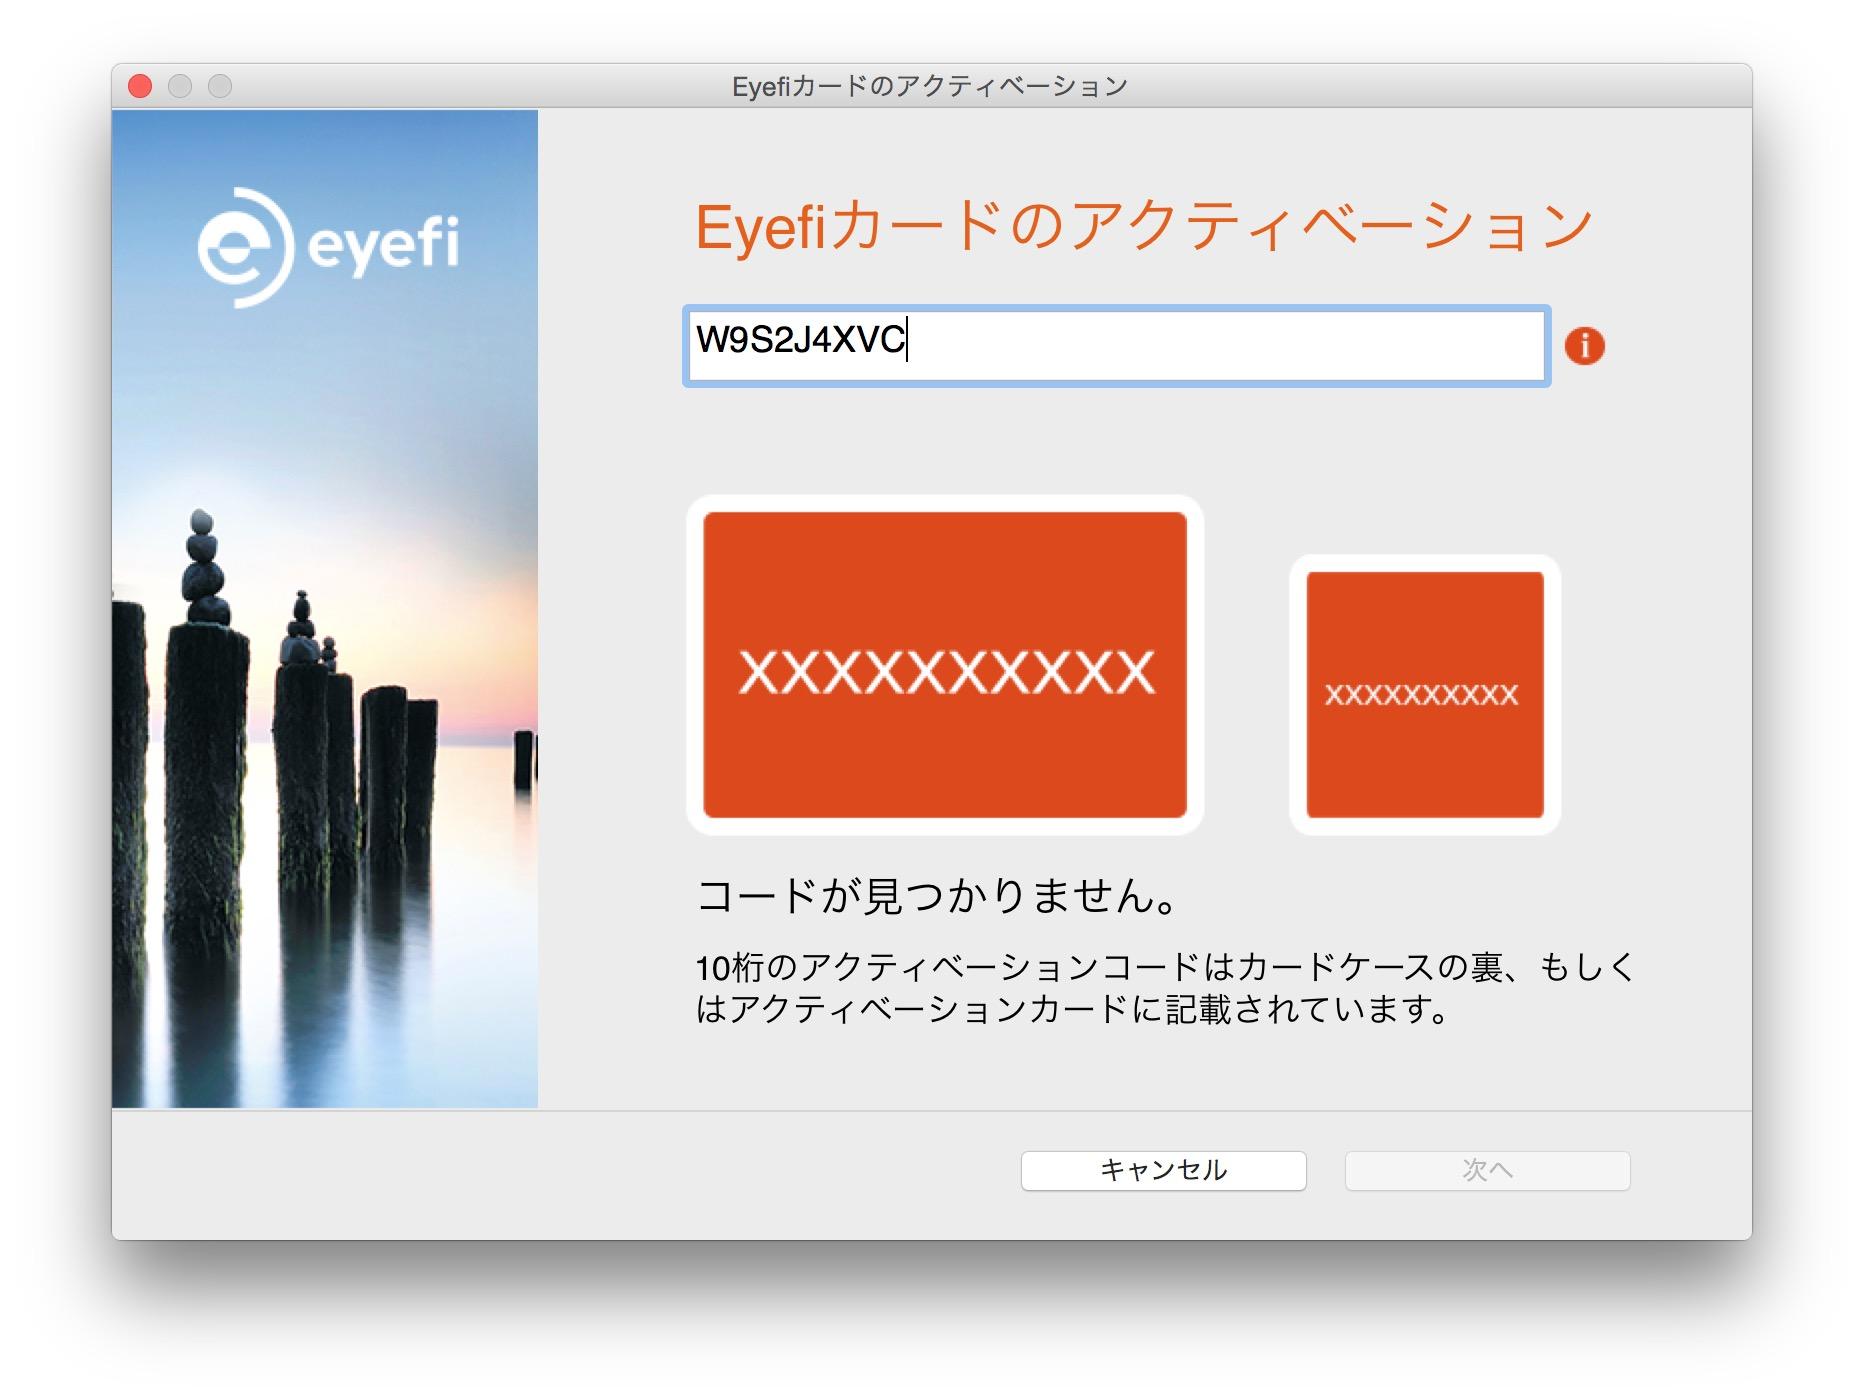 eyefimobi16gb025.jpg